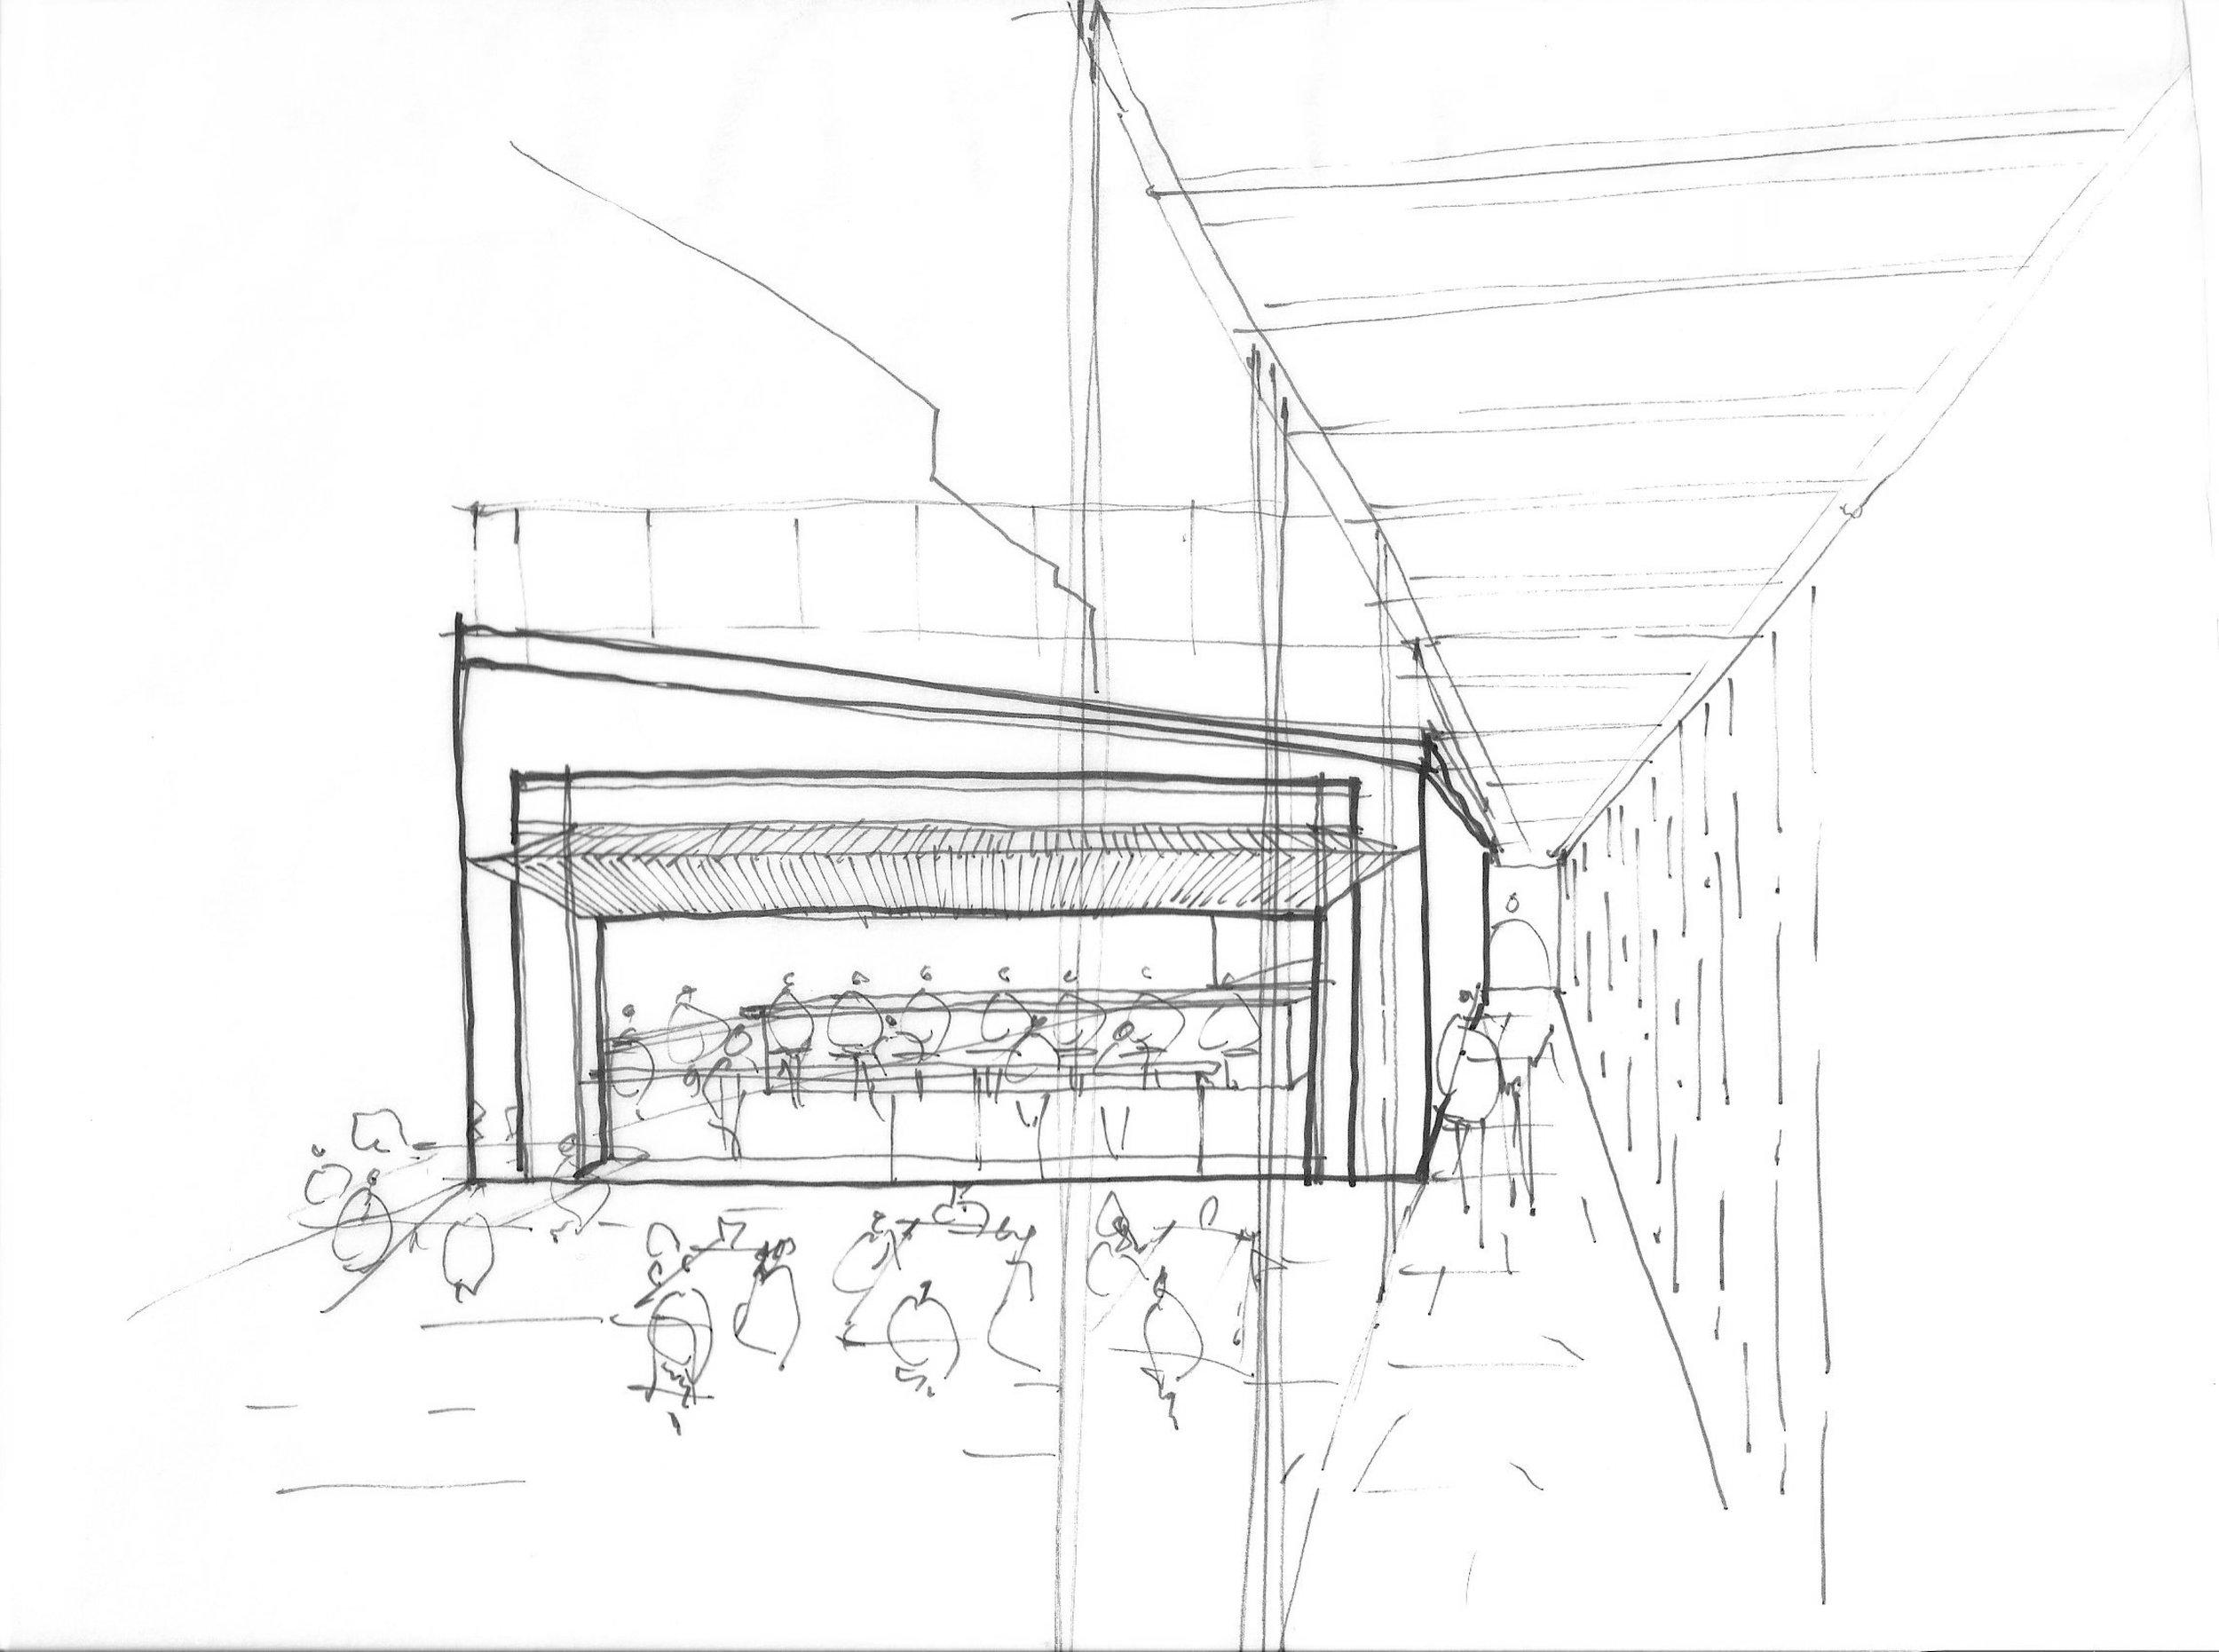 studio-saint-bars-and-restaurants-maketto-washington-dc-sketch-5